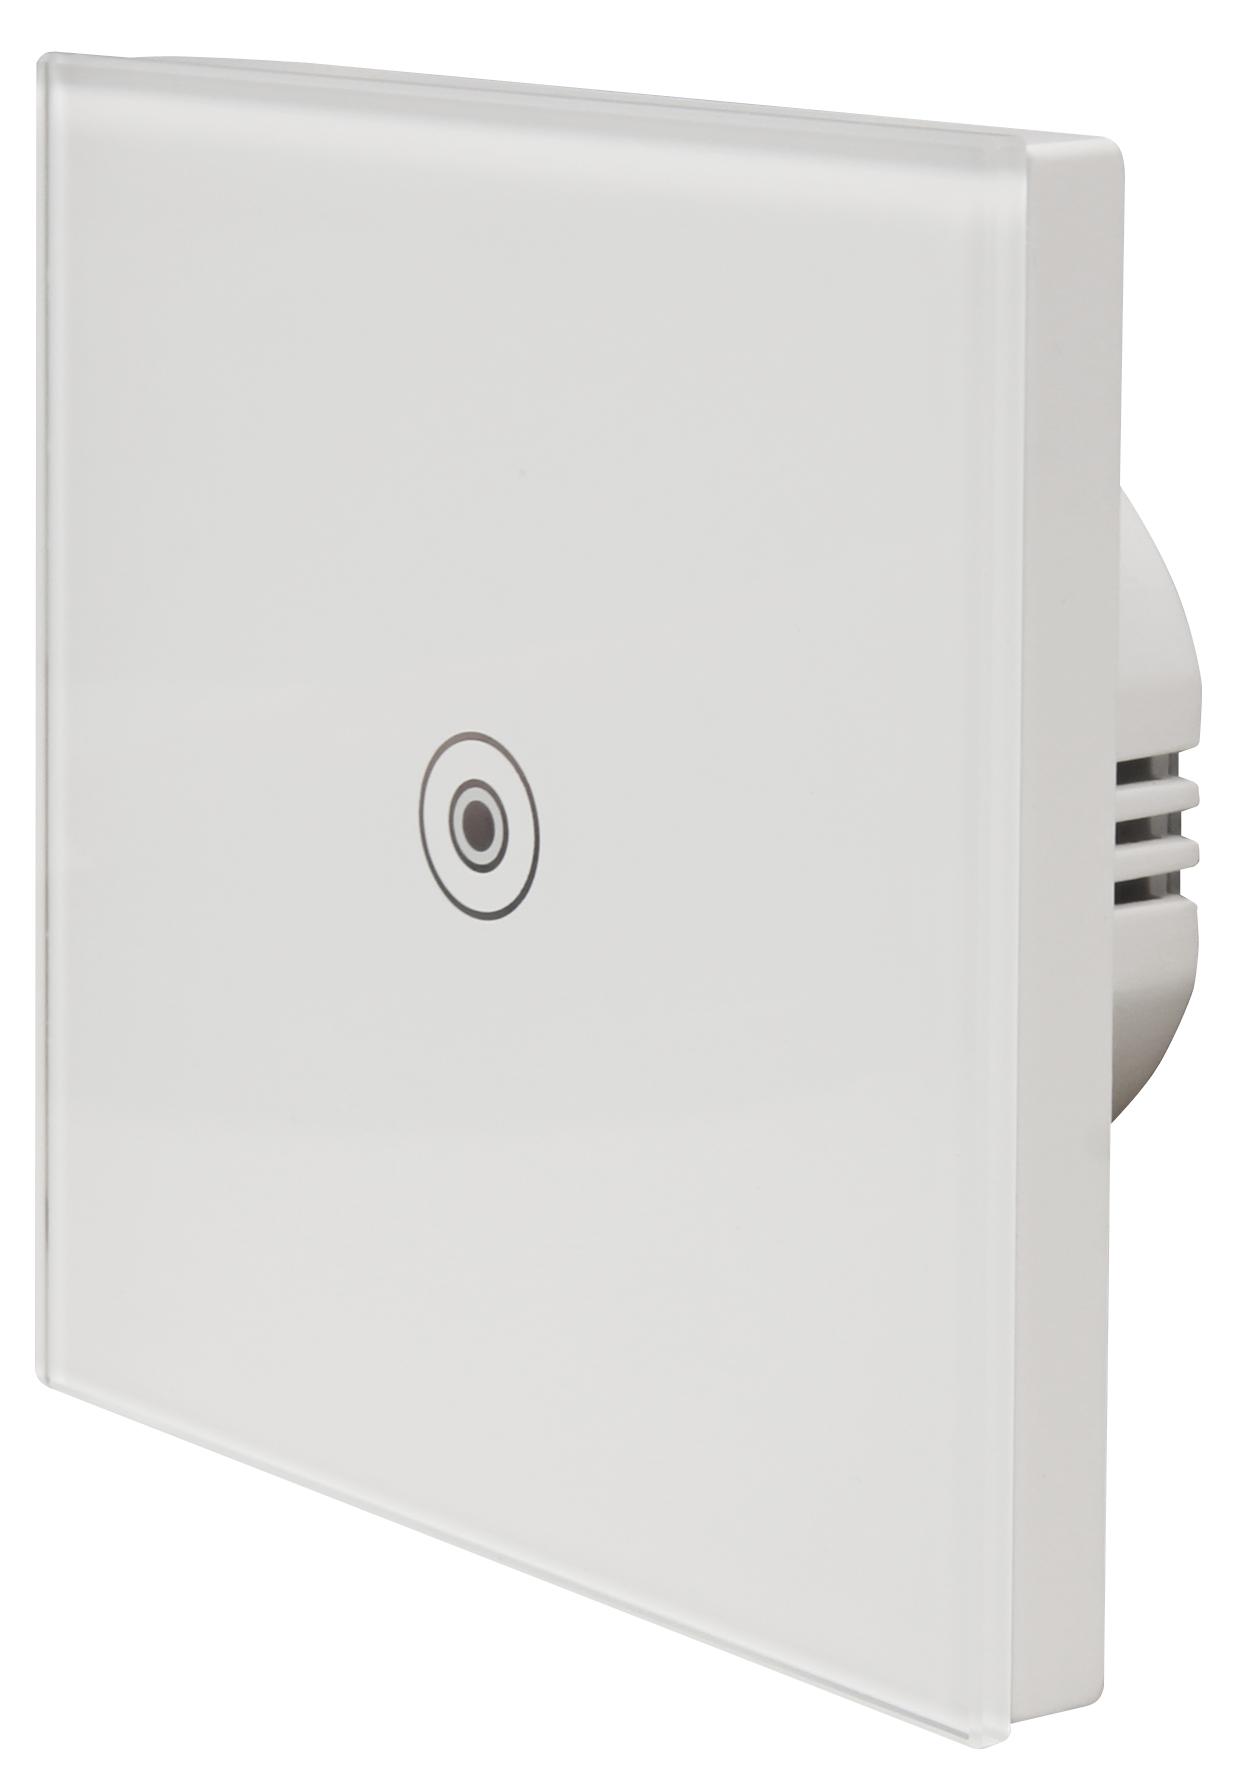 Touch Schalter McPower ''FLAIR'' 250V~/5A, Glas mit LED Kontroll-Leuchte, 1-fach